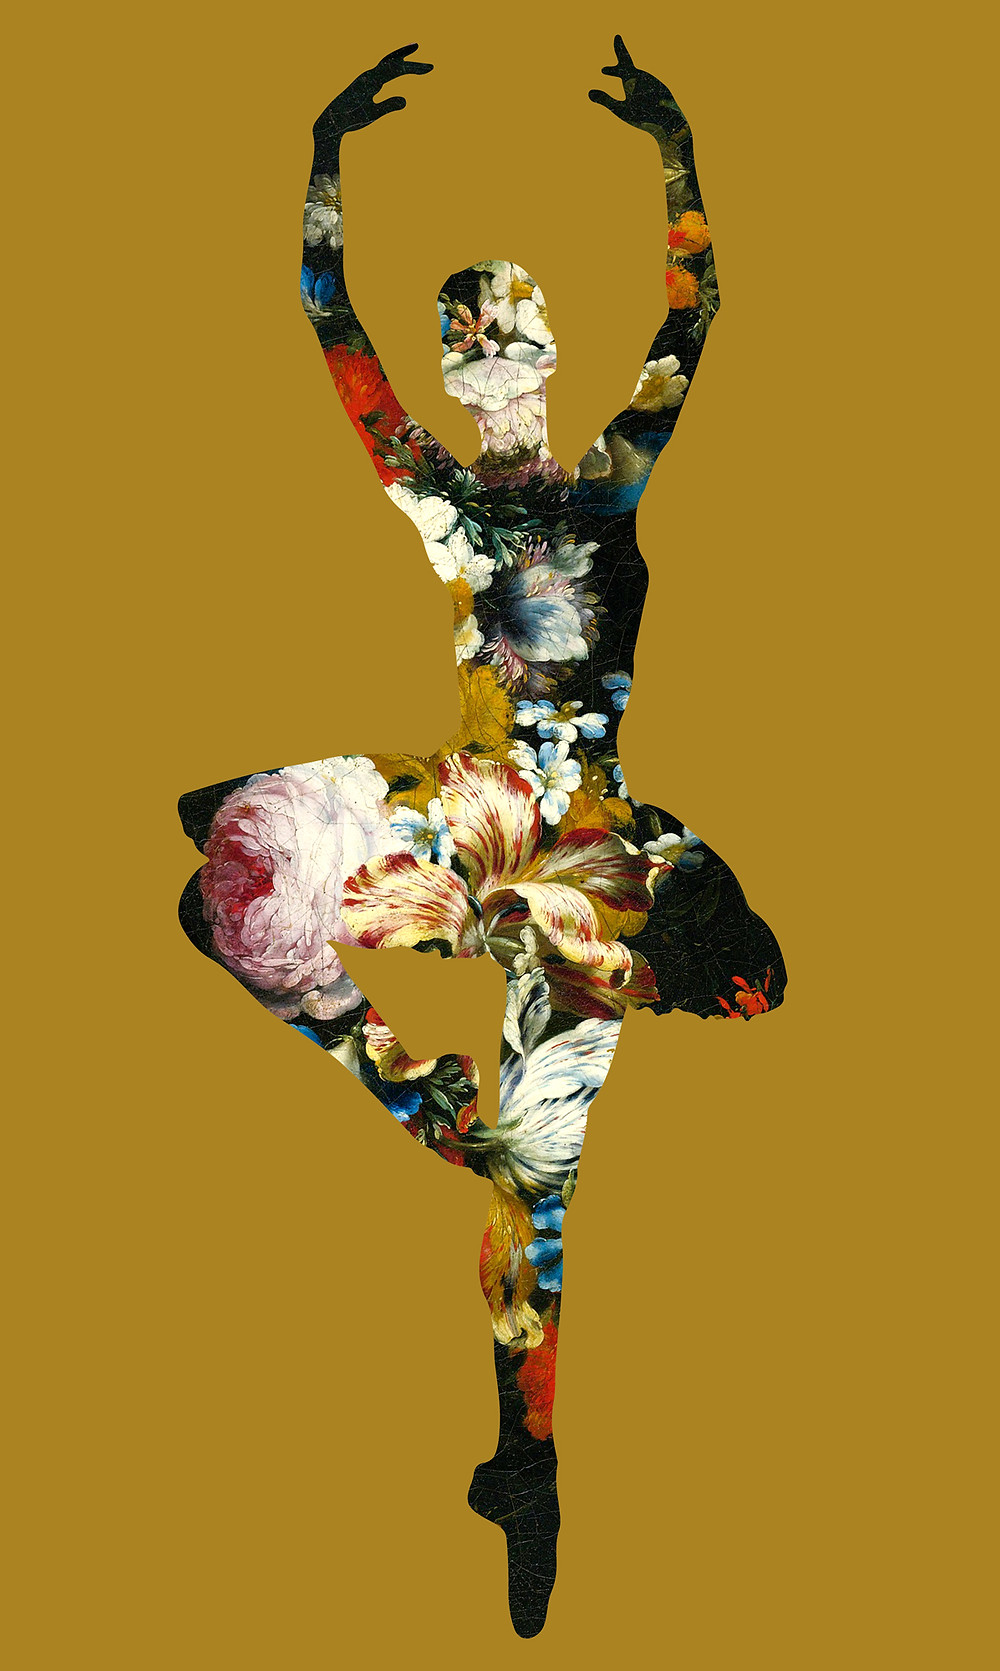 flowers, artwork, dancer